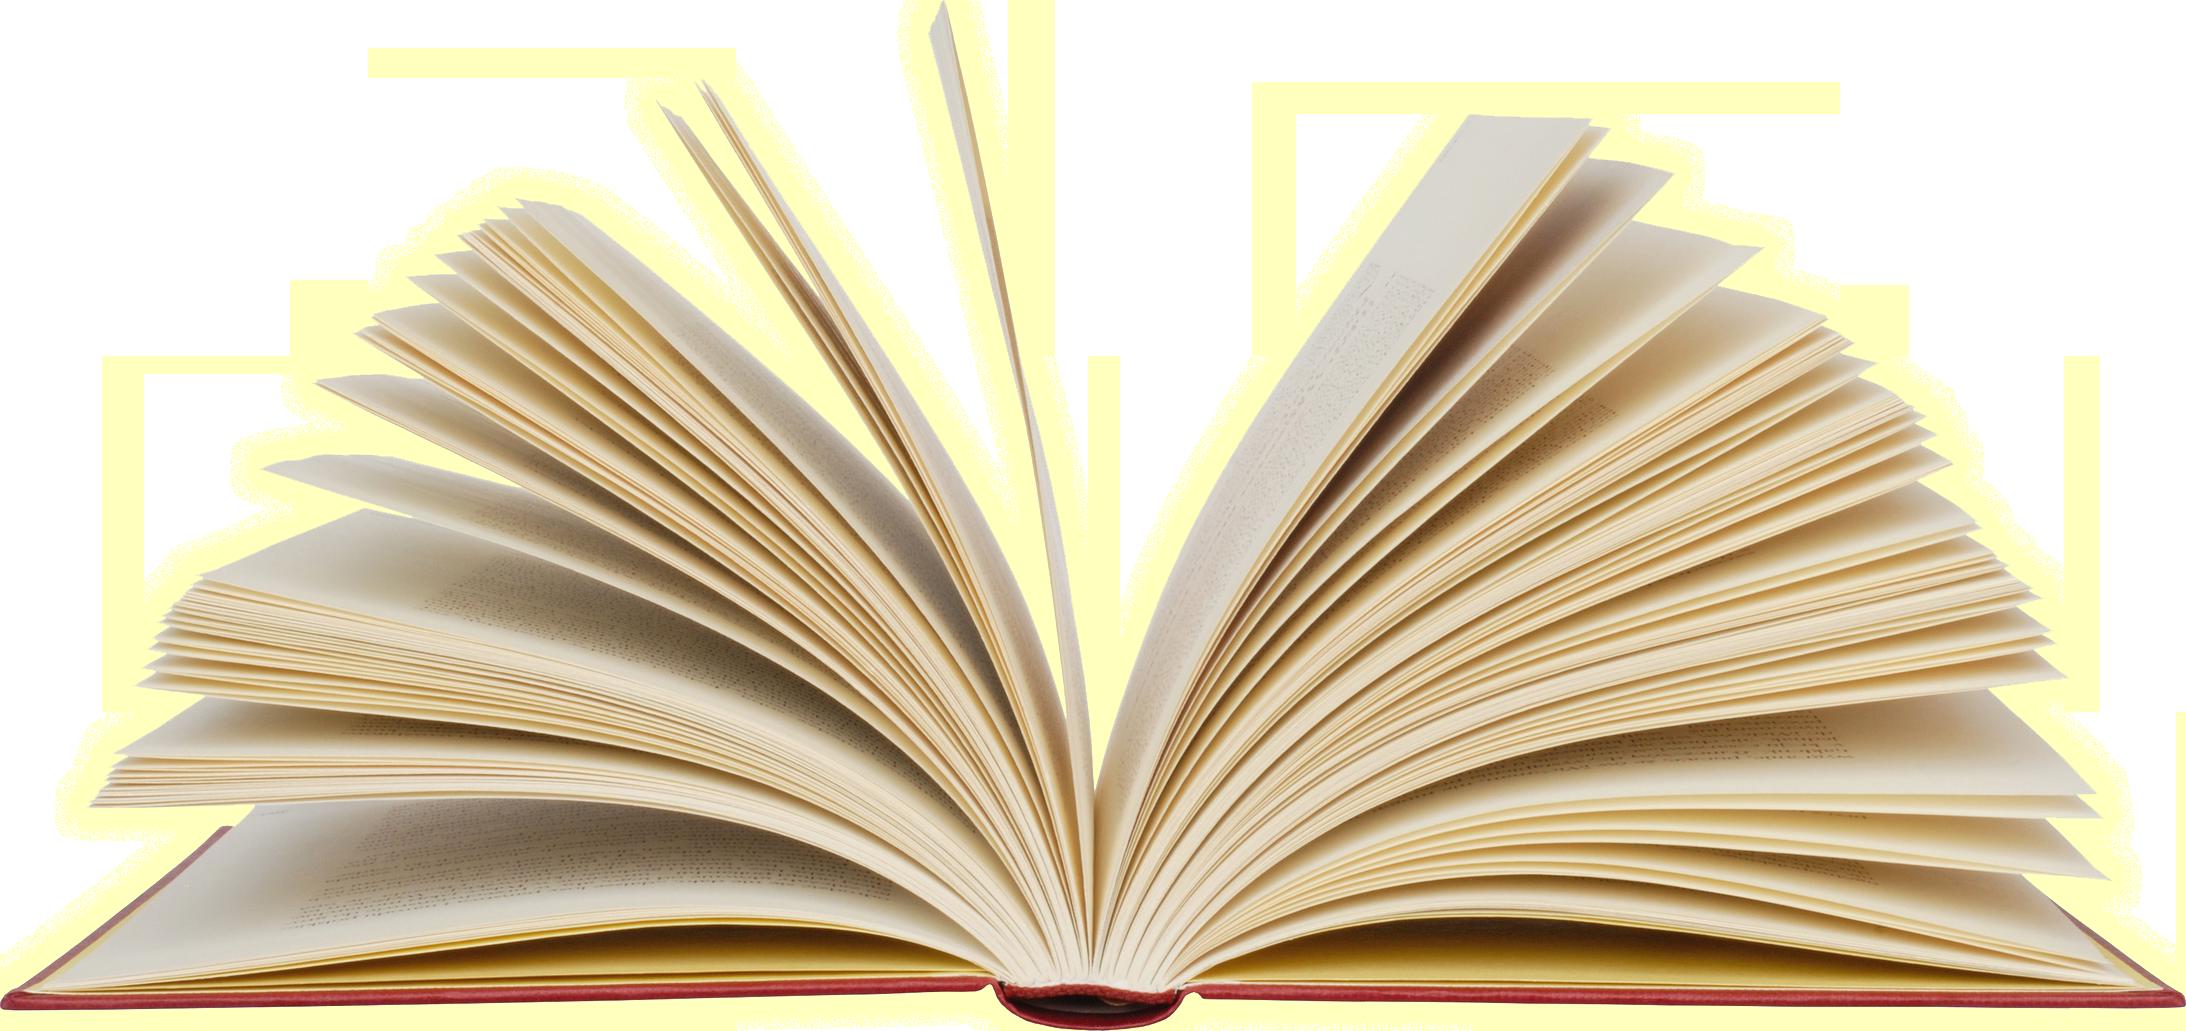 Book PNG Images Transparent Free Download.